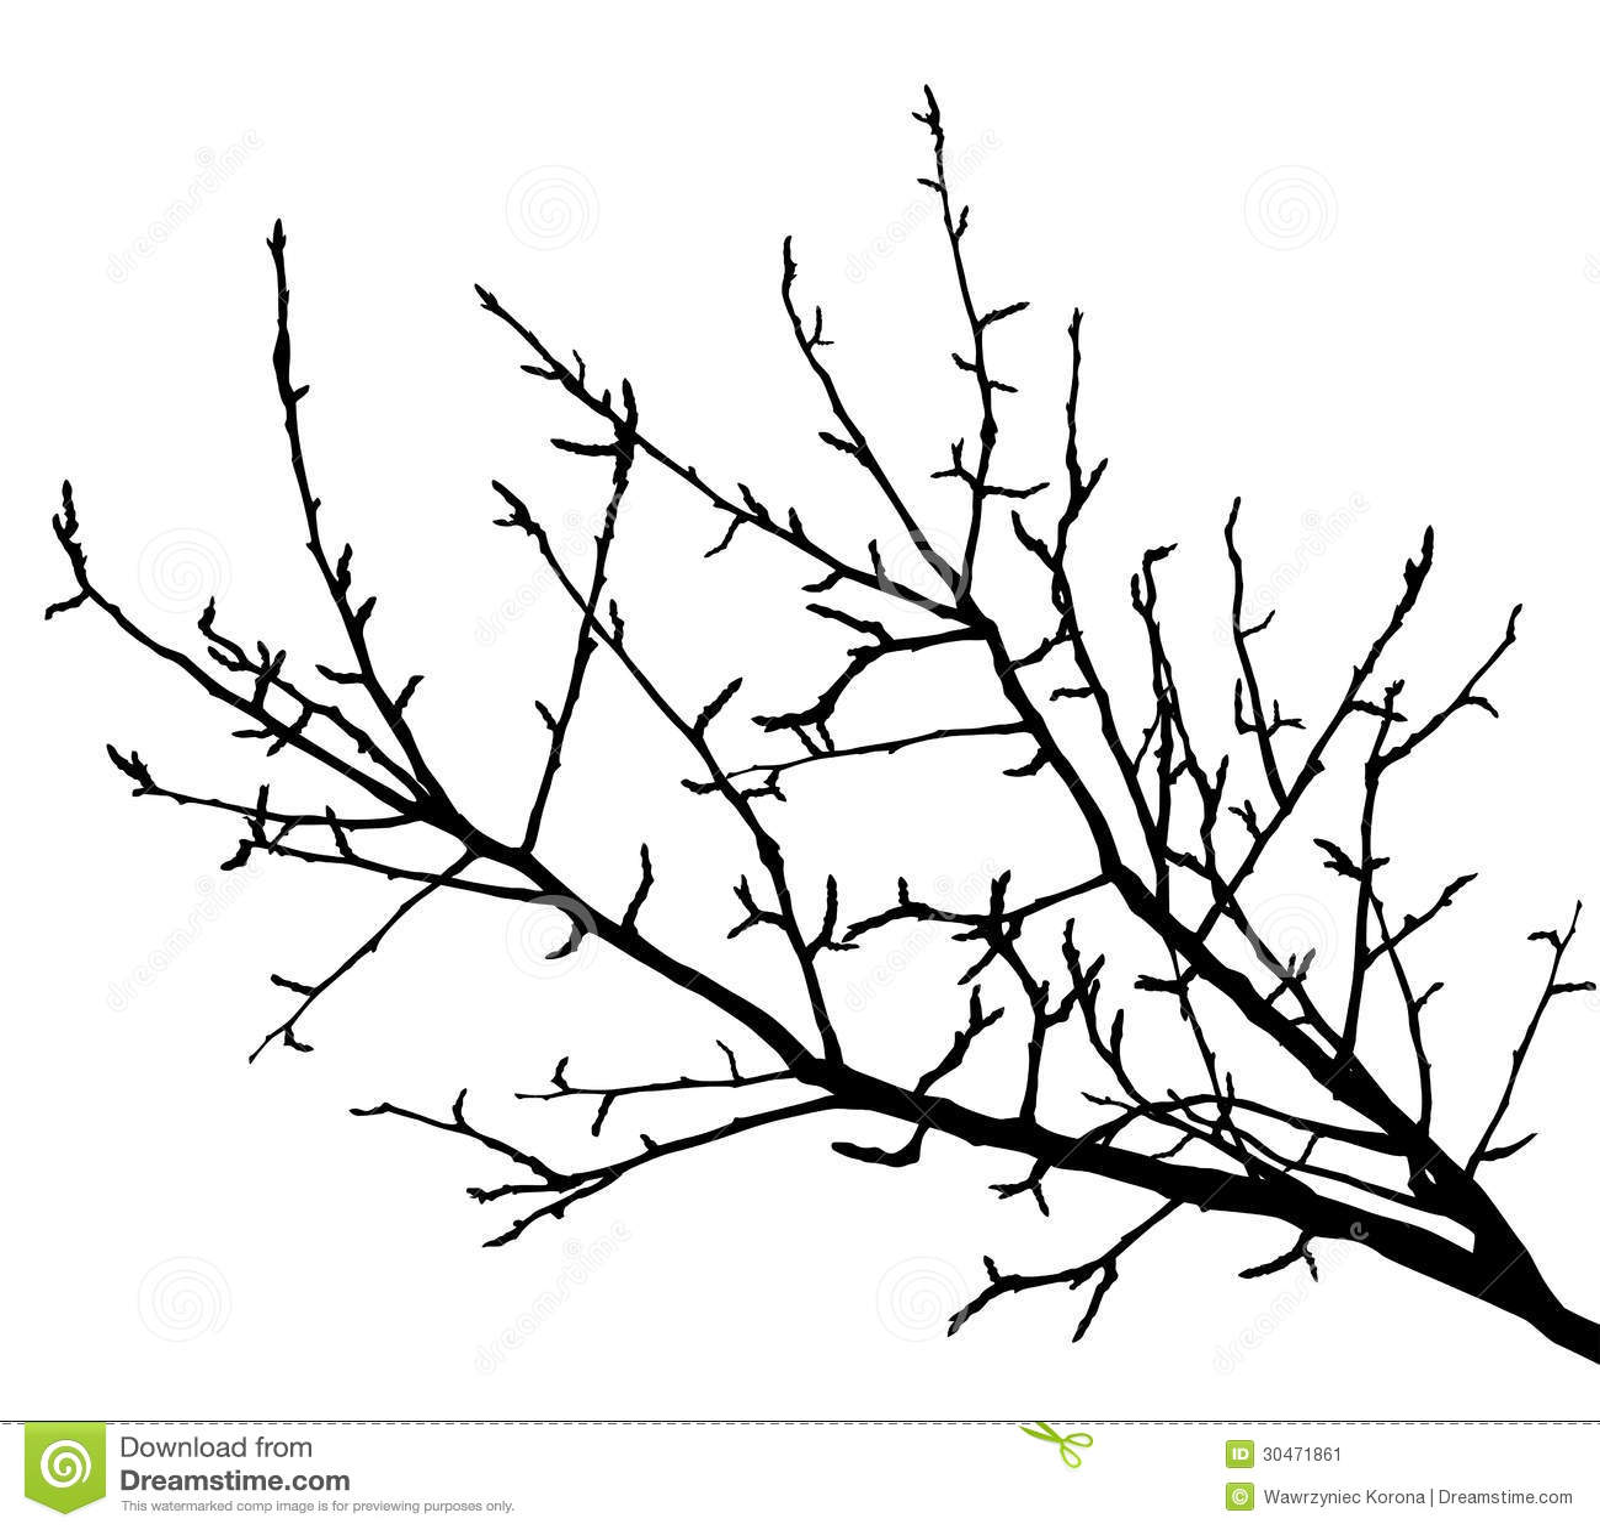 branches branching tree diagram bathtub drain installation silhouette vector illustration stock